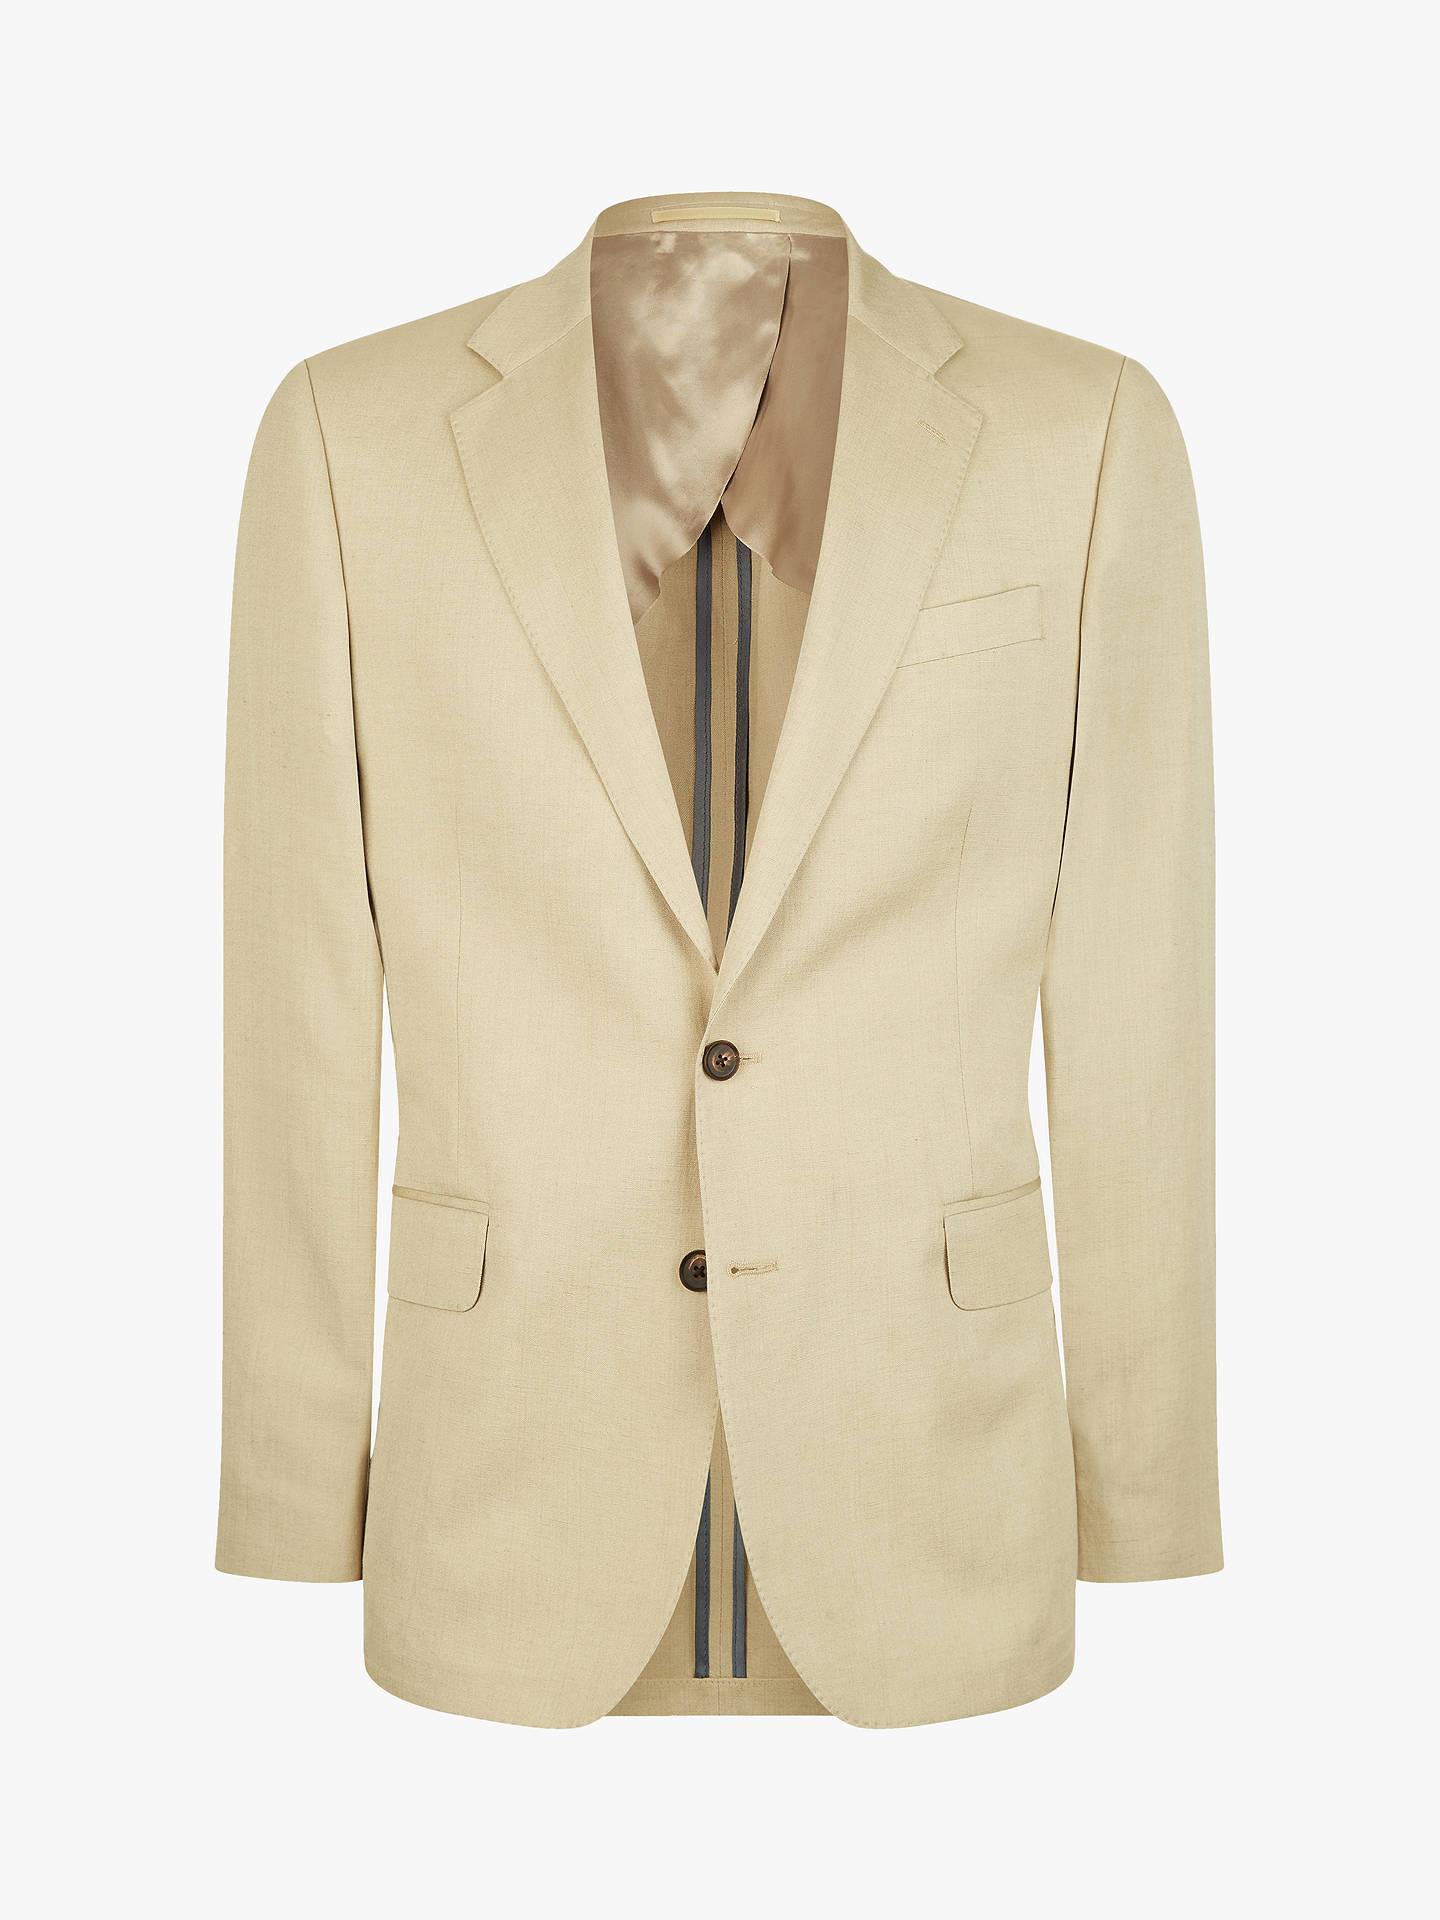 d73abeb65 Jaeger Silk Linen Regular Fit Suit Jacket, Cream